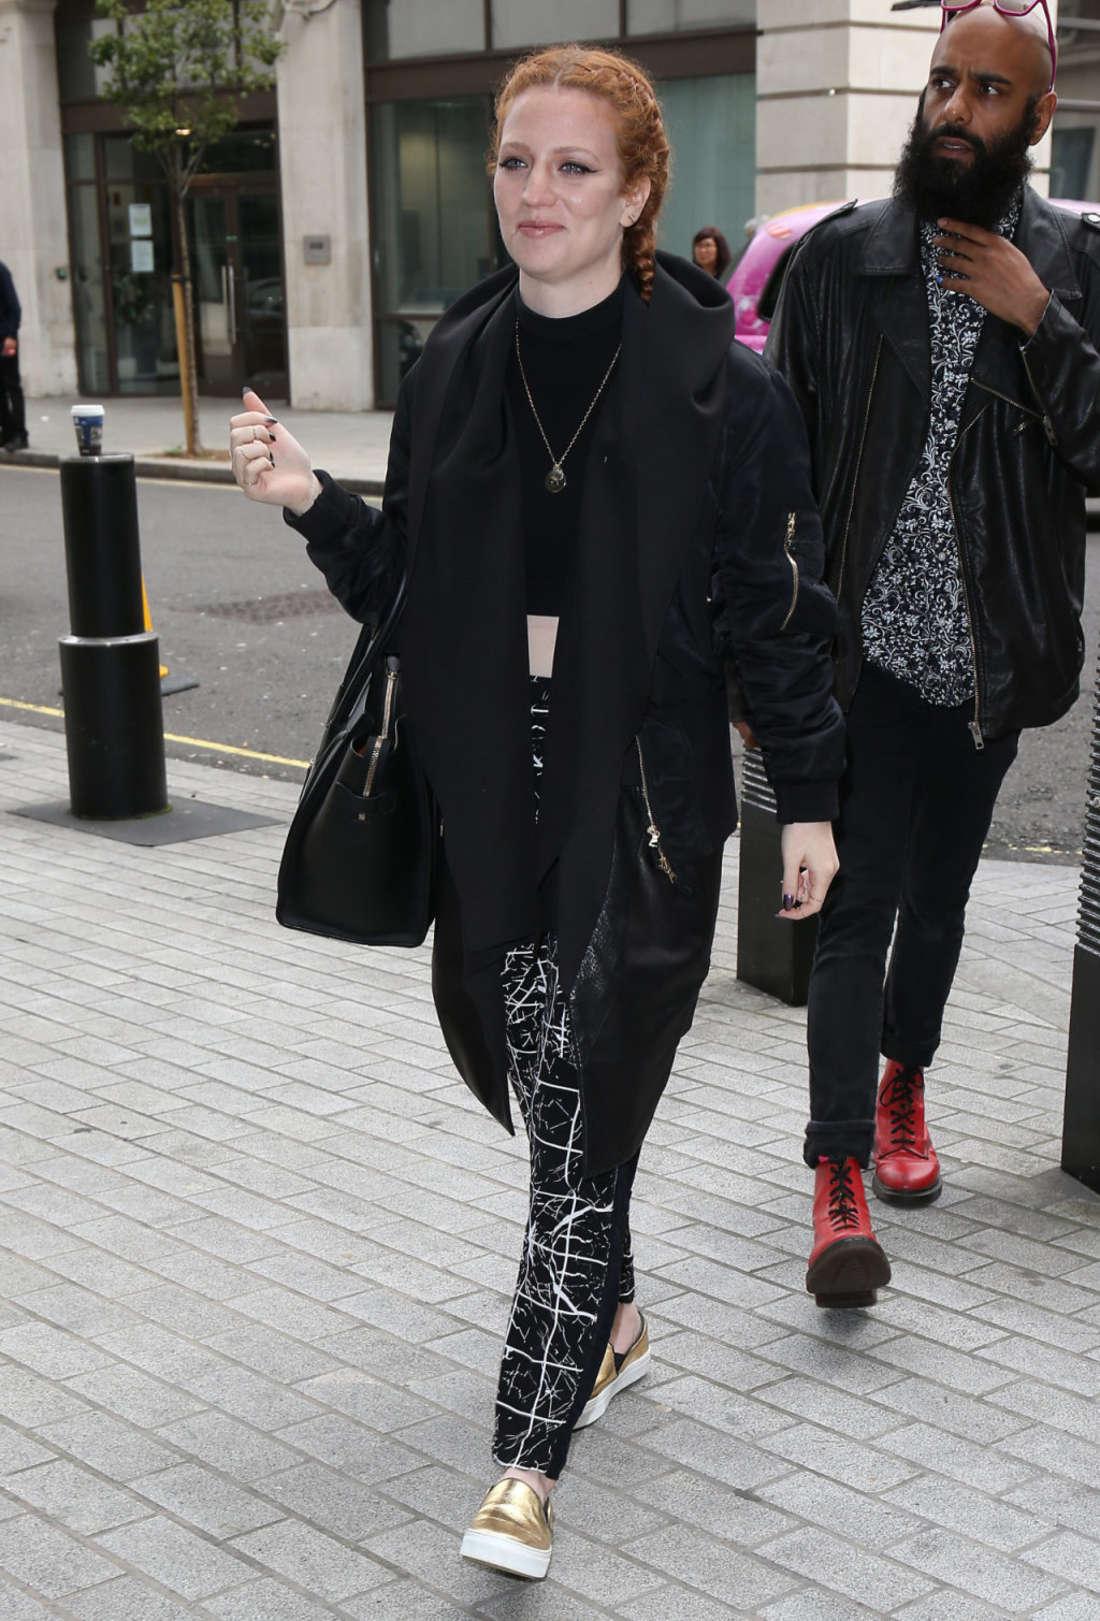 Jess Glynne Seen at BBC Radio One in London